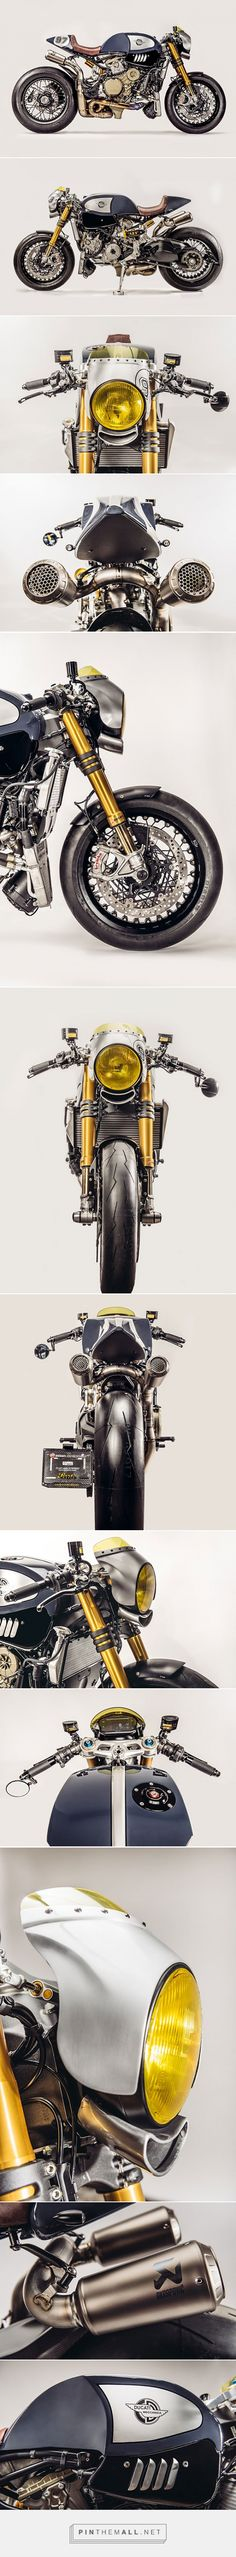 'The Blue Shark' Ducati Panigale R Cafe Racer - Ducati Zentralschweiz & Parts World